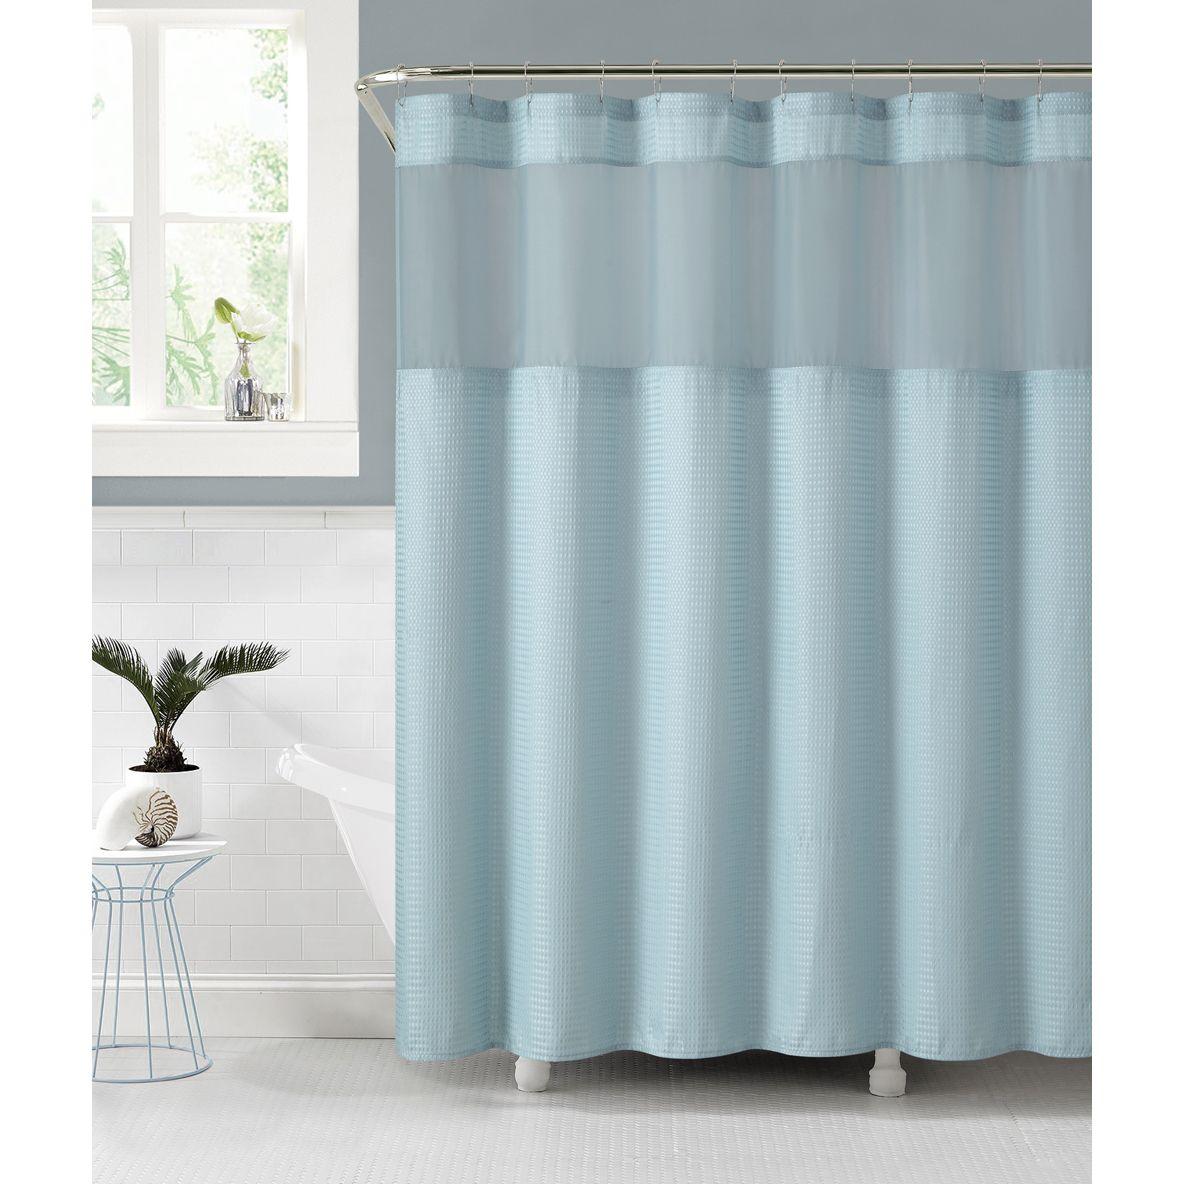 Vcny Celine Shower Curtain | B_Celine | Pinterest | Celine, Bath and ...